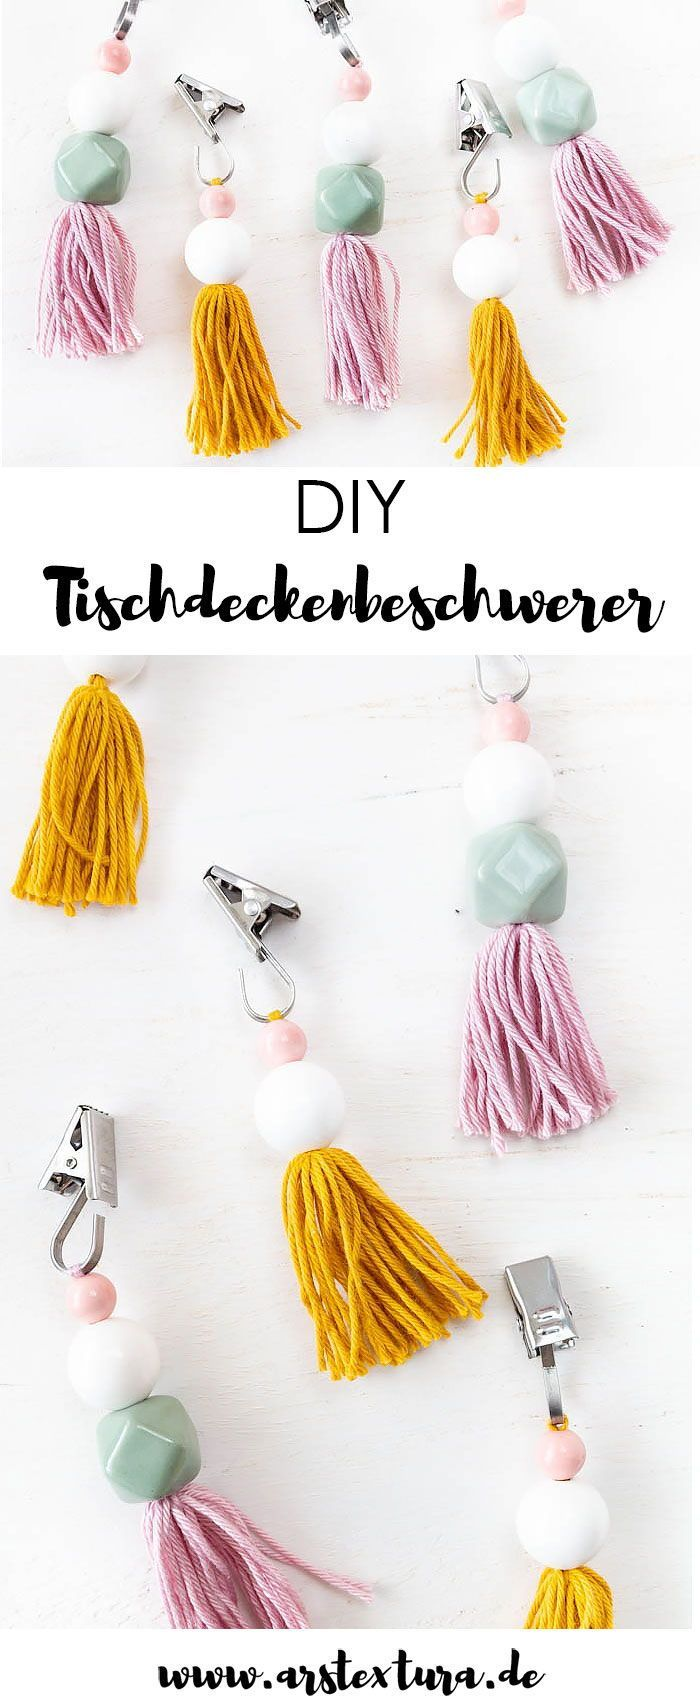 Photo of Make tablecloths yourself ars textura – DIY blog